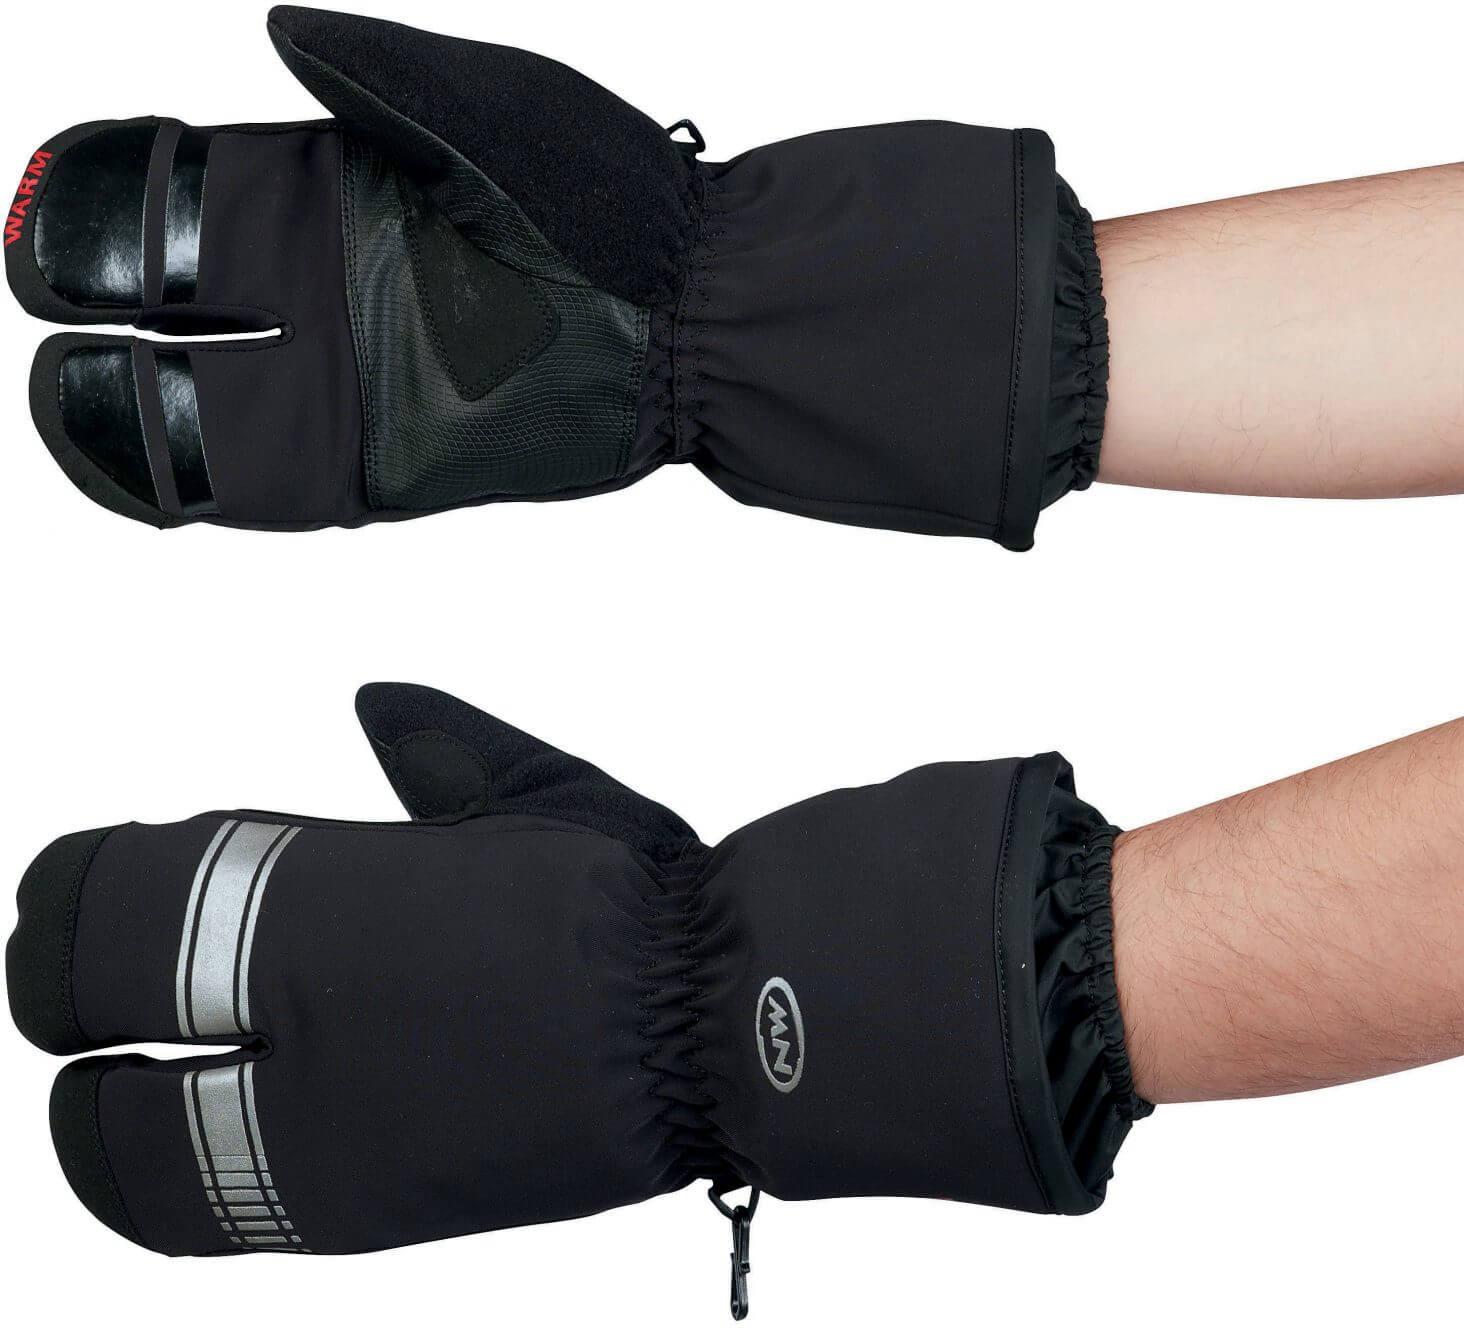 Husky gloves